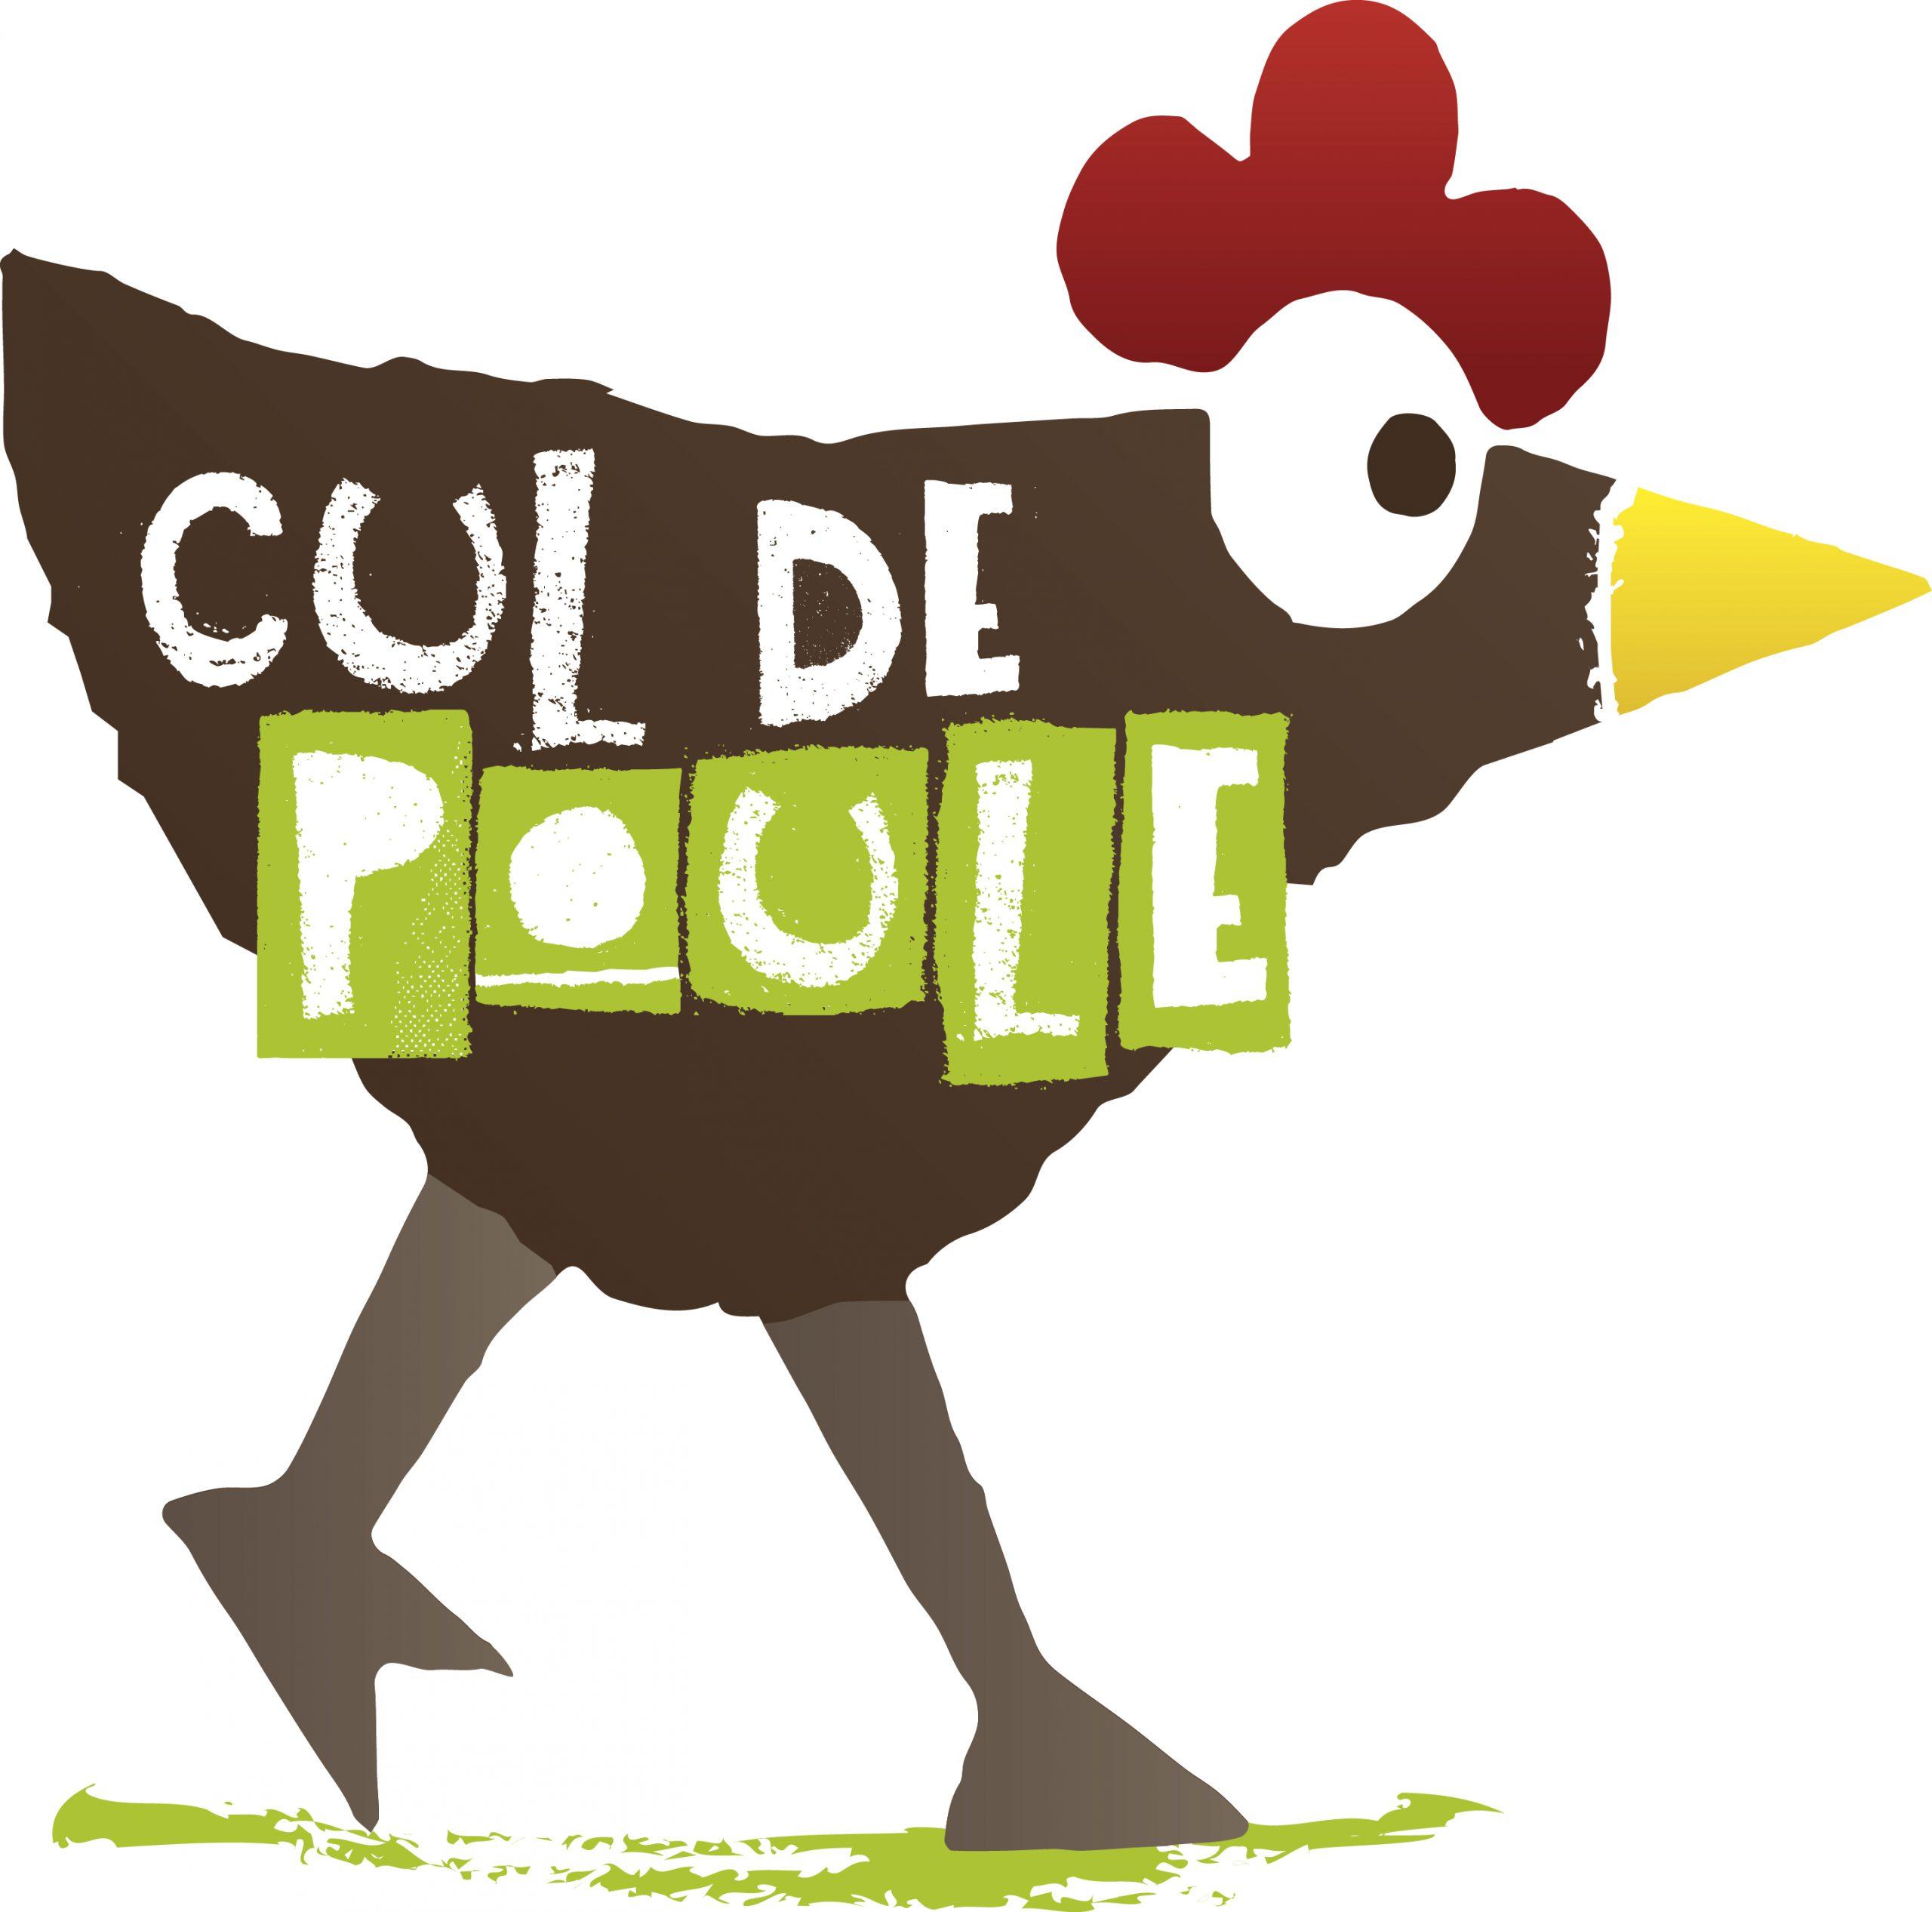 Arnaud_MOLLE_logo.jpg